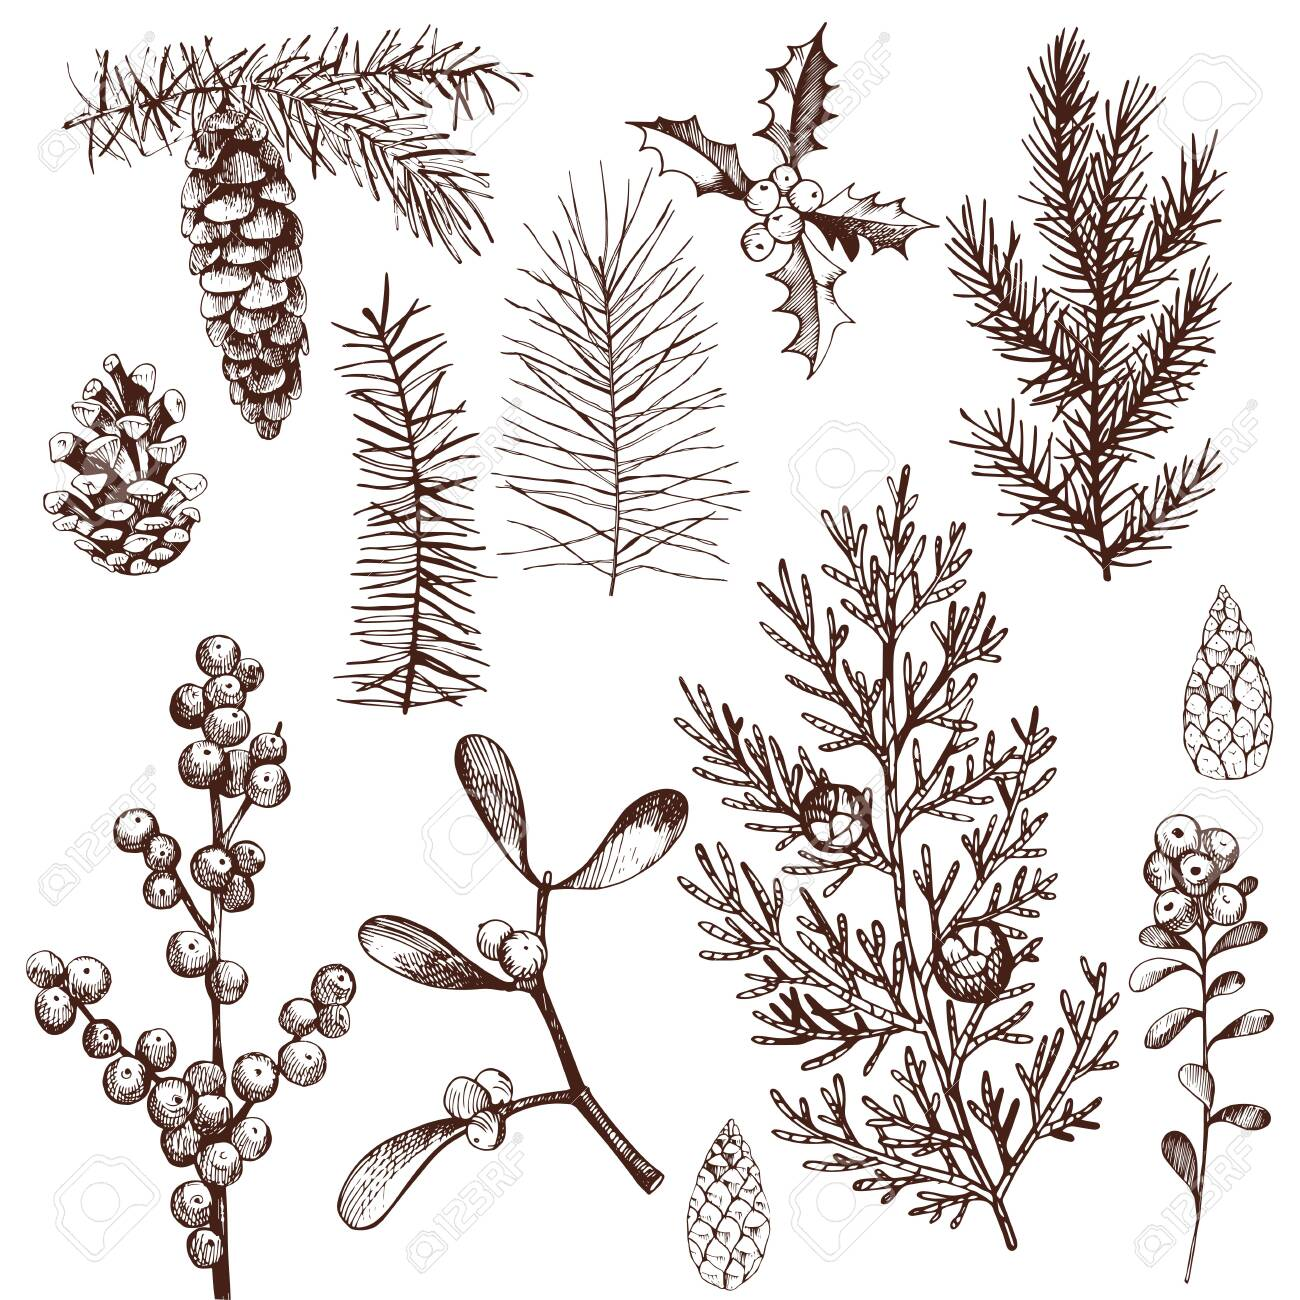 Christmas plants set. Vector hand-drawn illustration. - 153288777